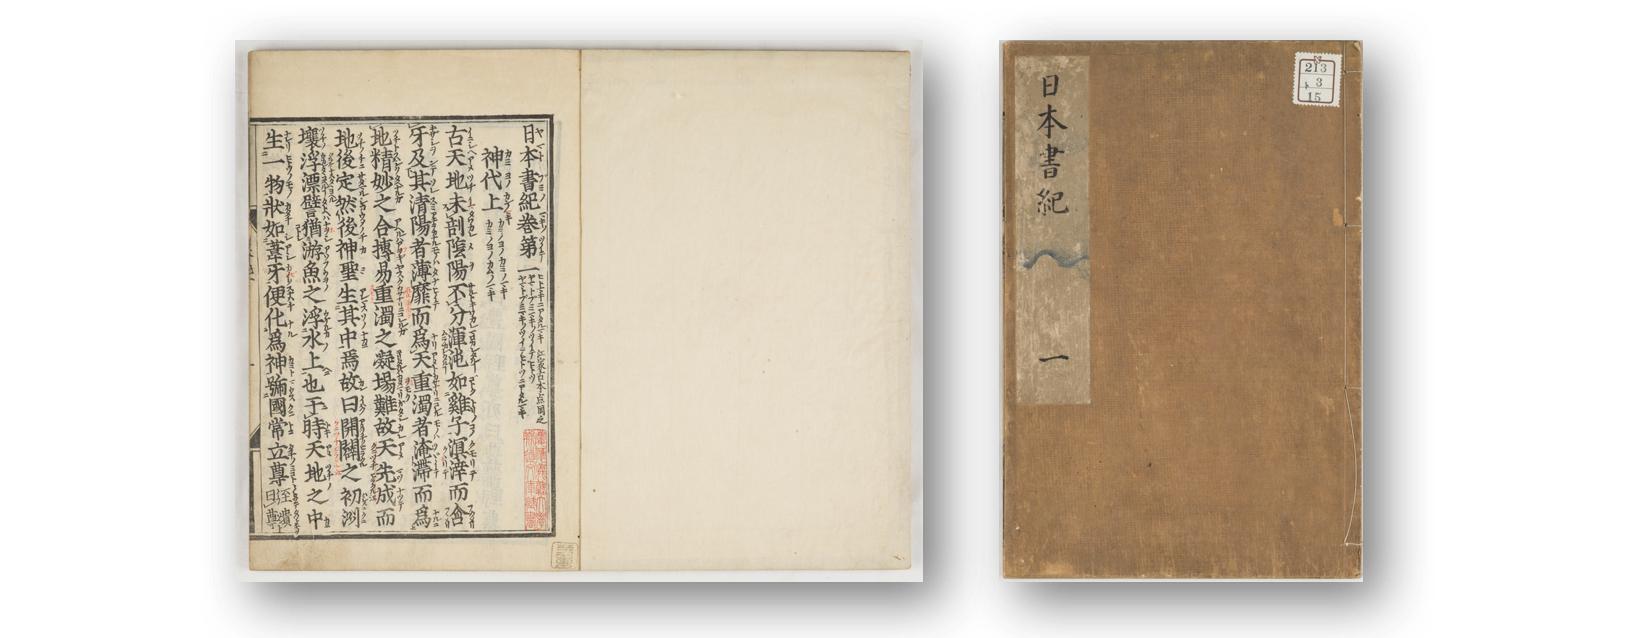 Nihon shoki(Chronicles of Japan), Kan'ei-era edition